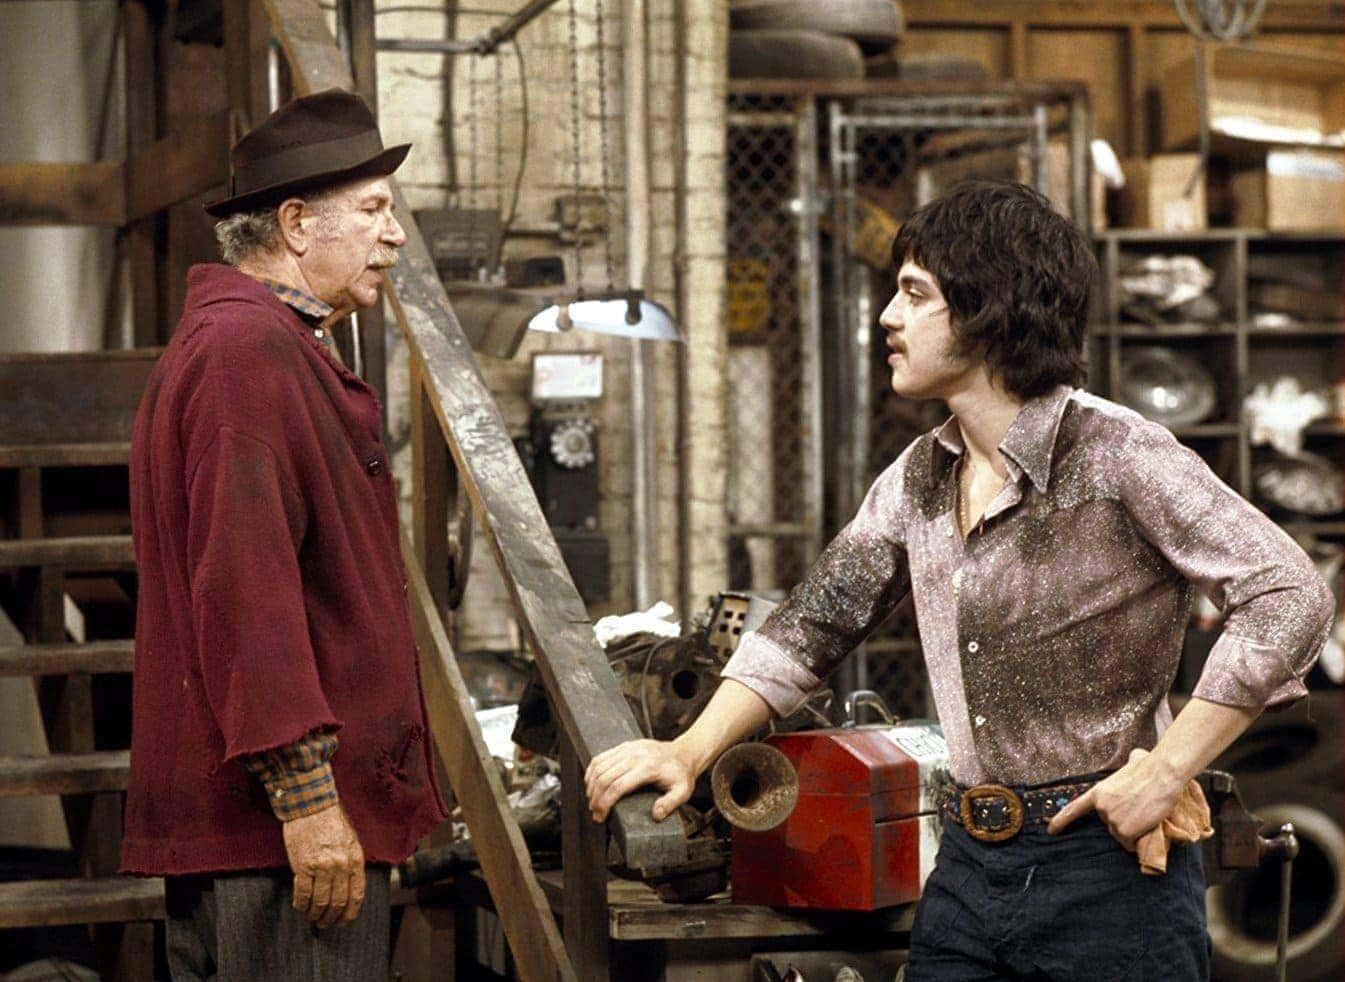 Chico and the Man - Jack Albertson Freddie Prinze